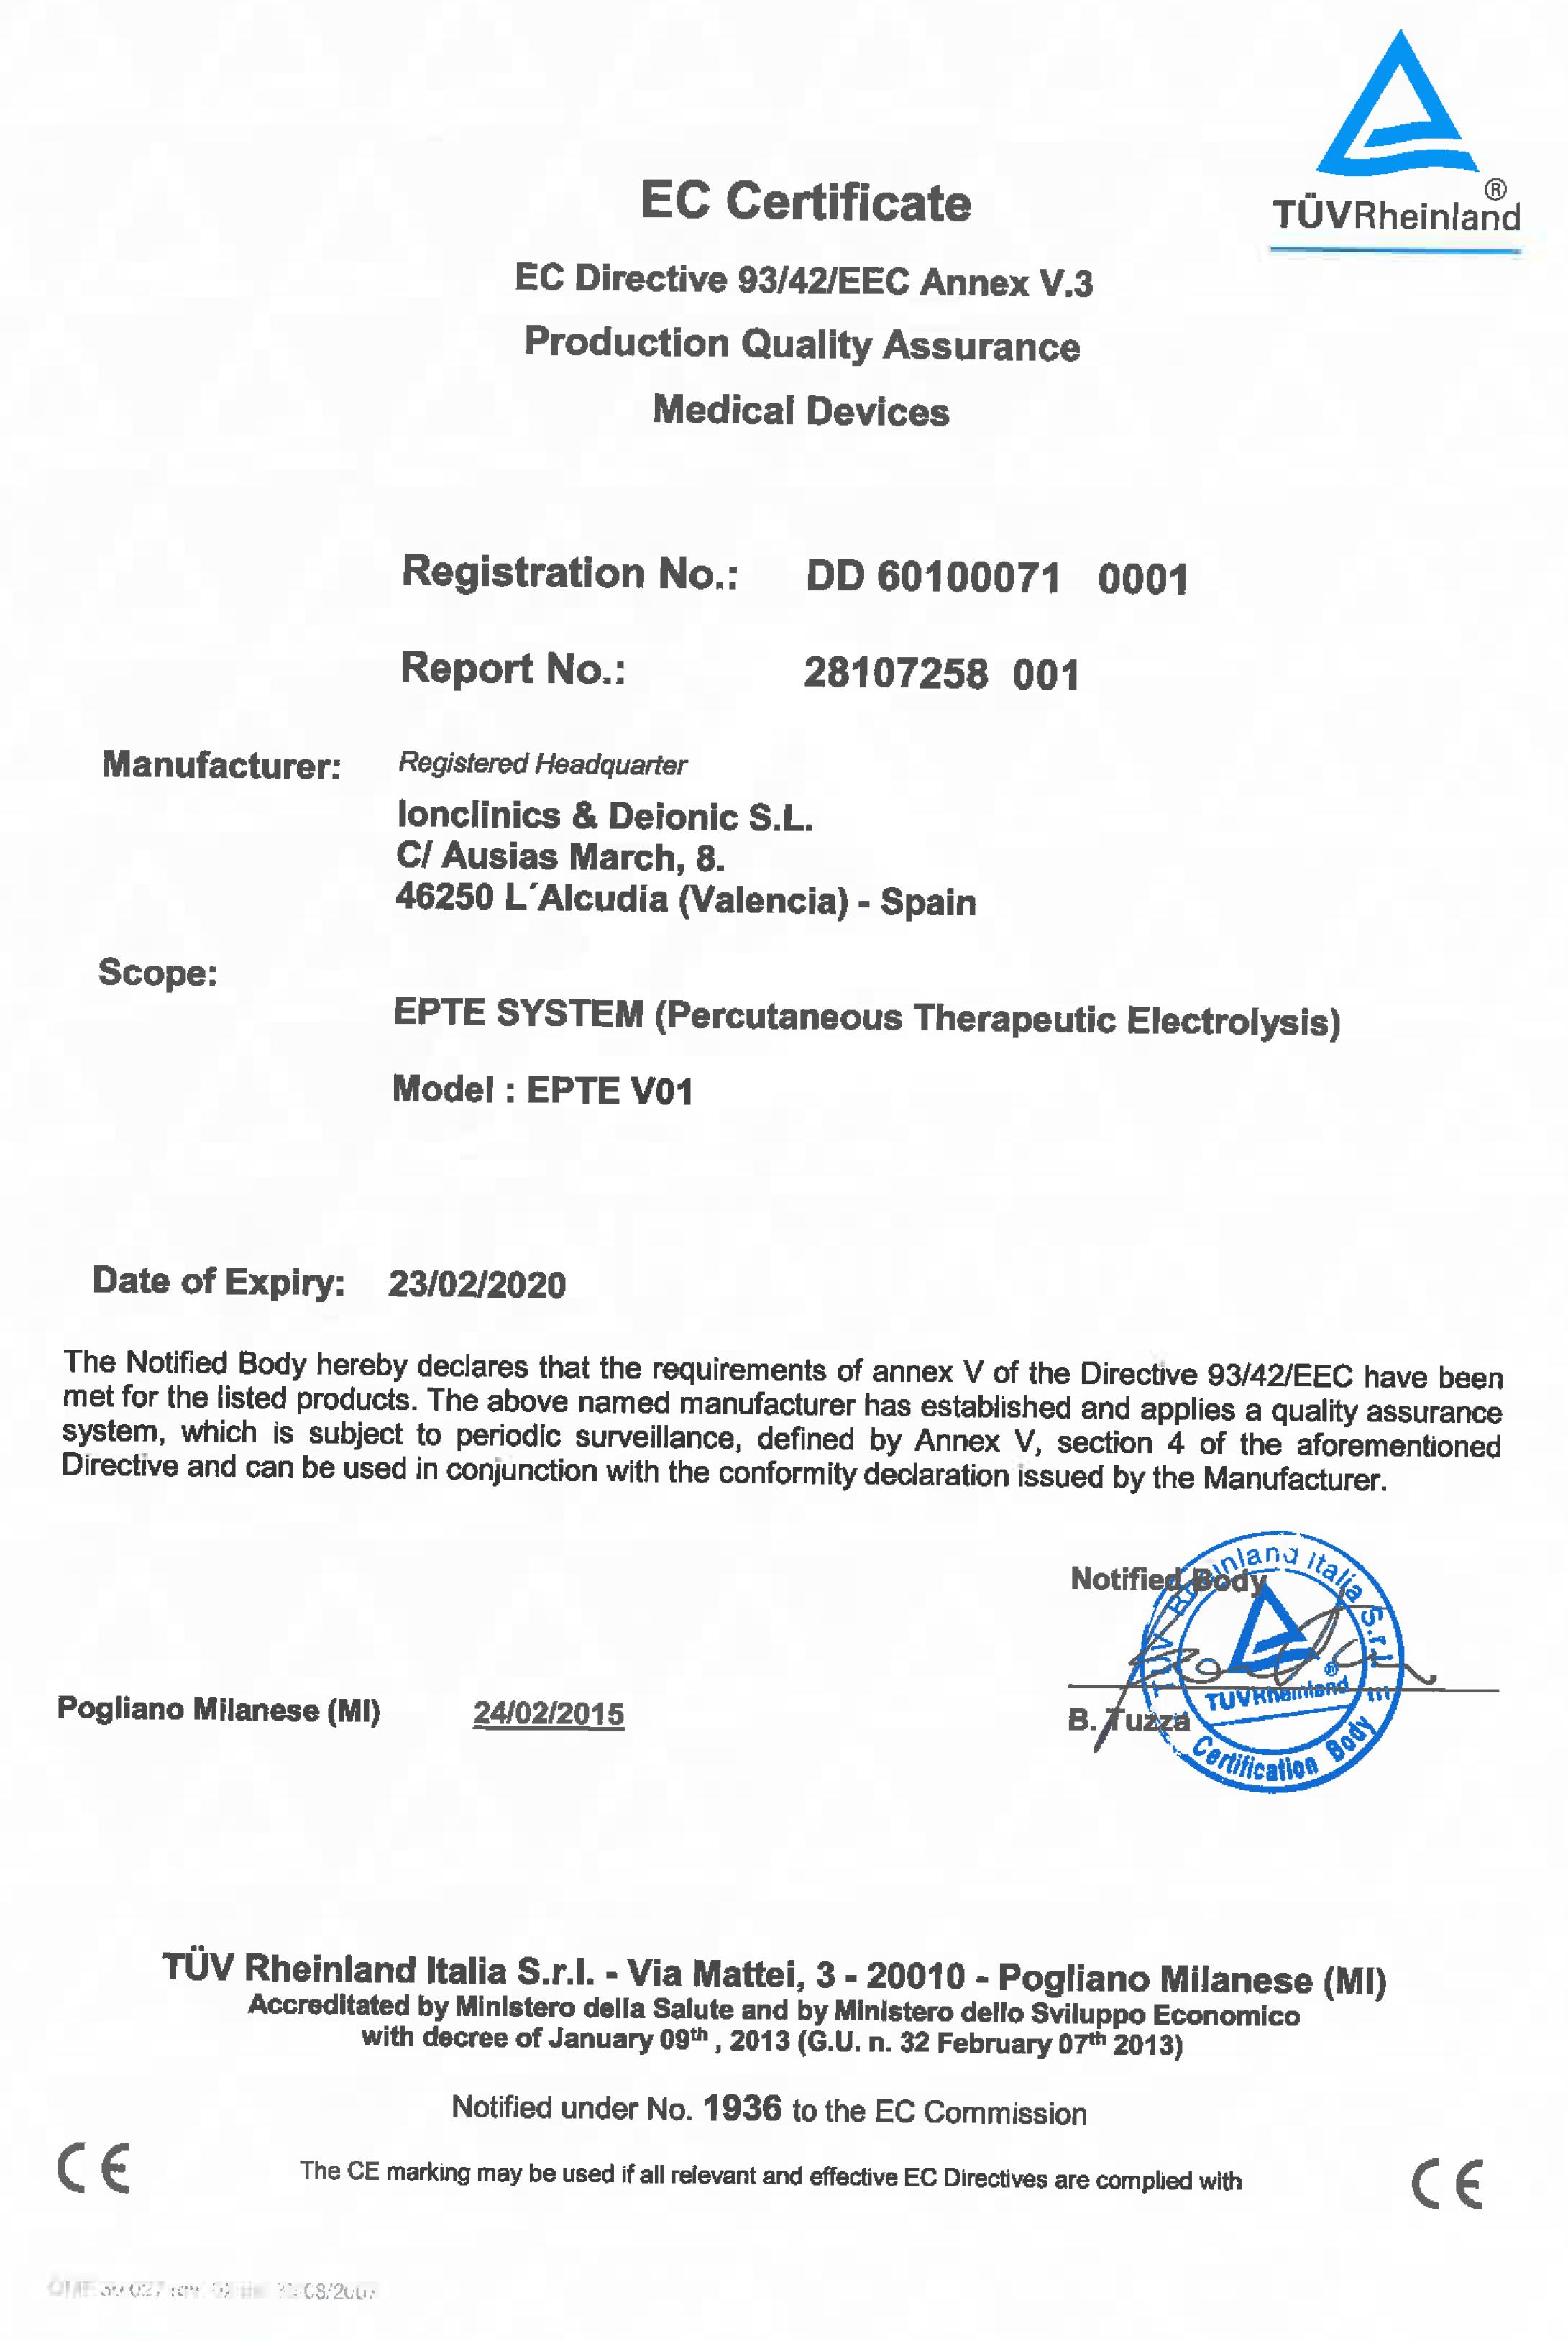 certificado-ce-sanitario-epte-tuv.jpg